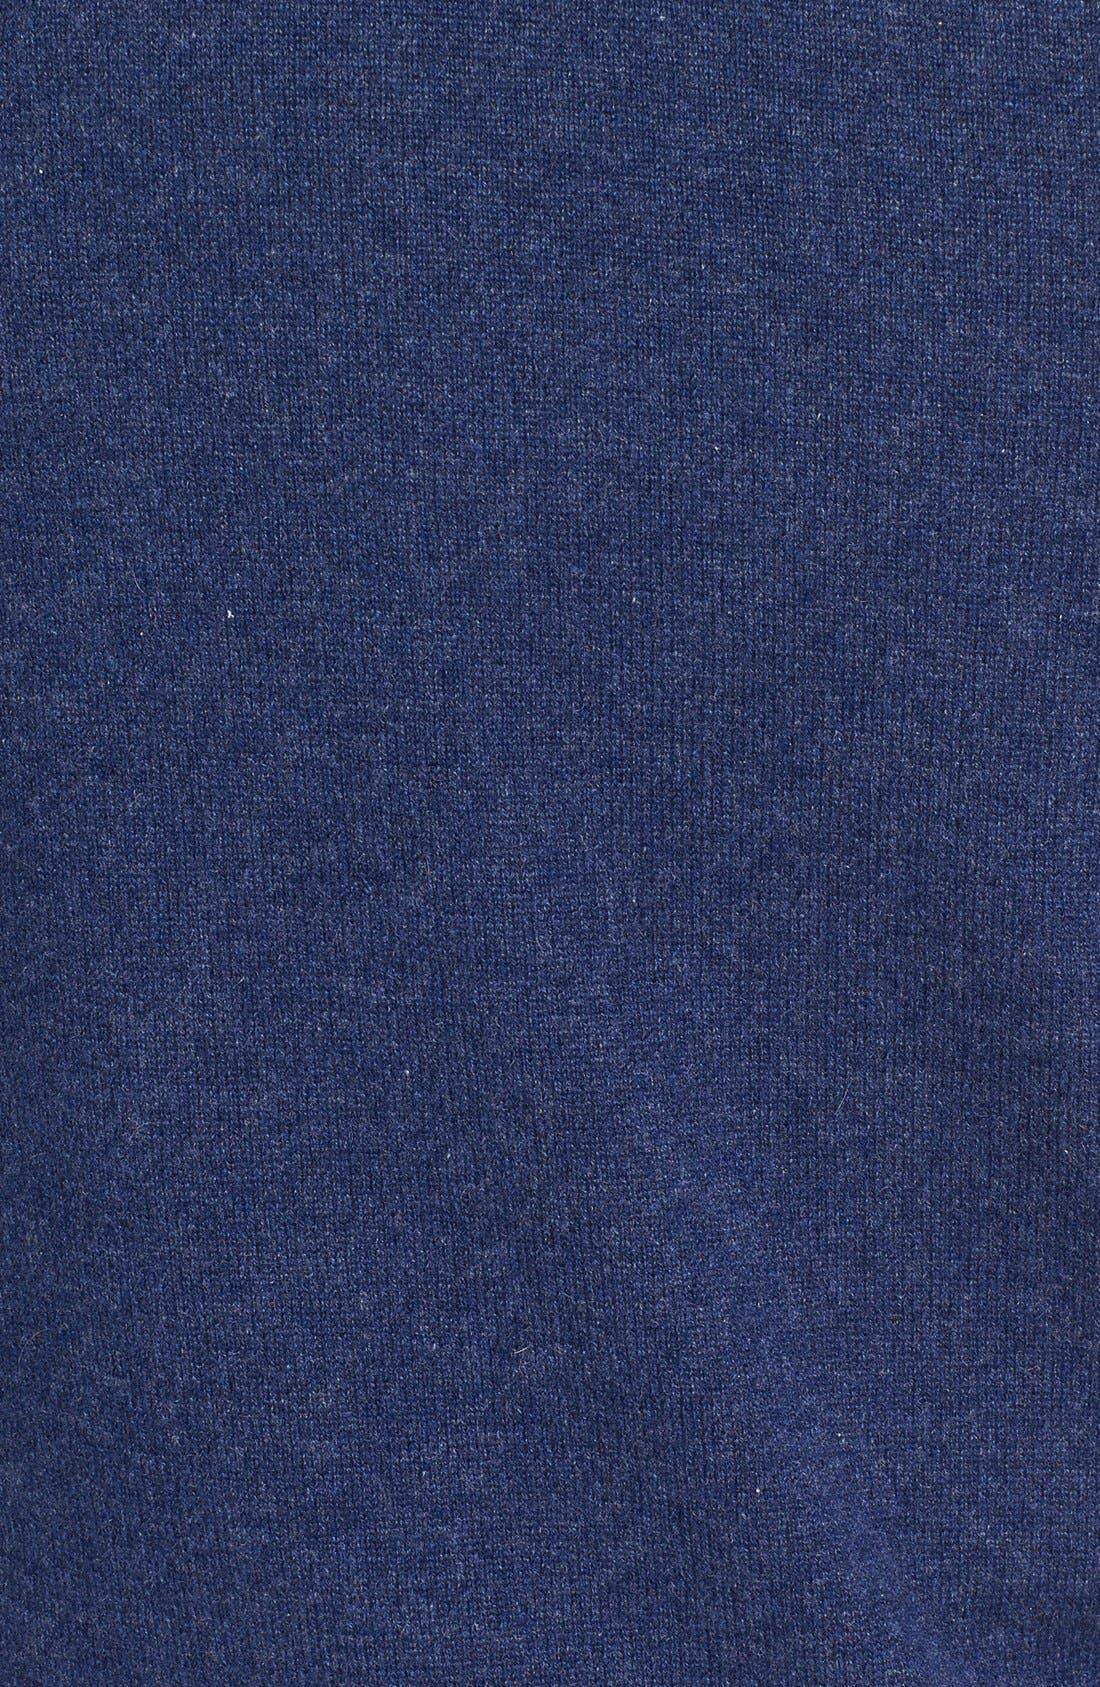 Cashmere V-Neck Sweater Vest,                             Alternate thumbnail 10, color,                             BLUE ESTATE HEATHER